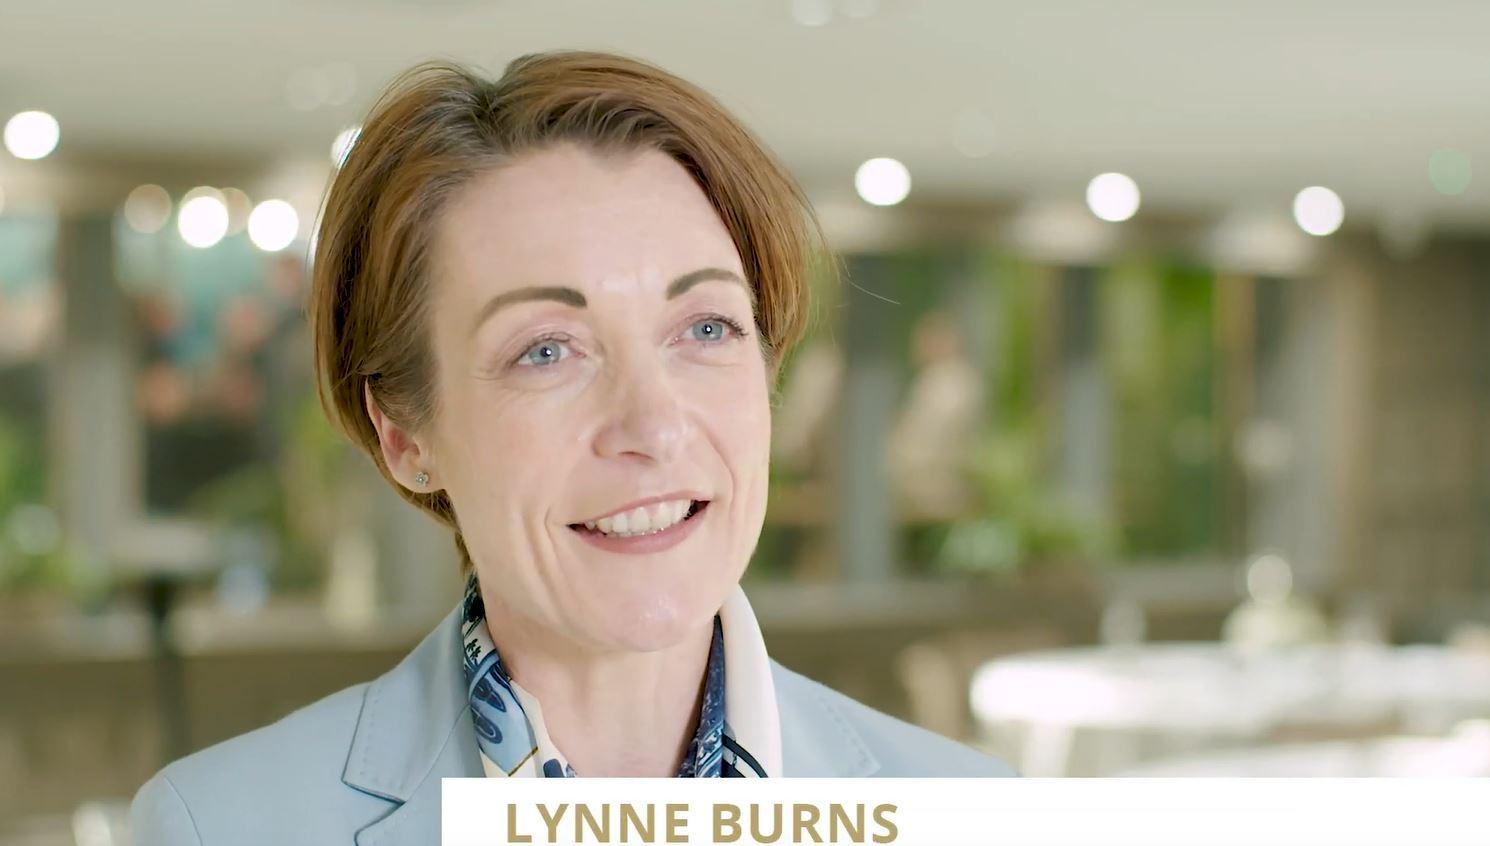 Lynne Burns as Vice-Chair